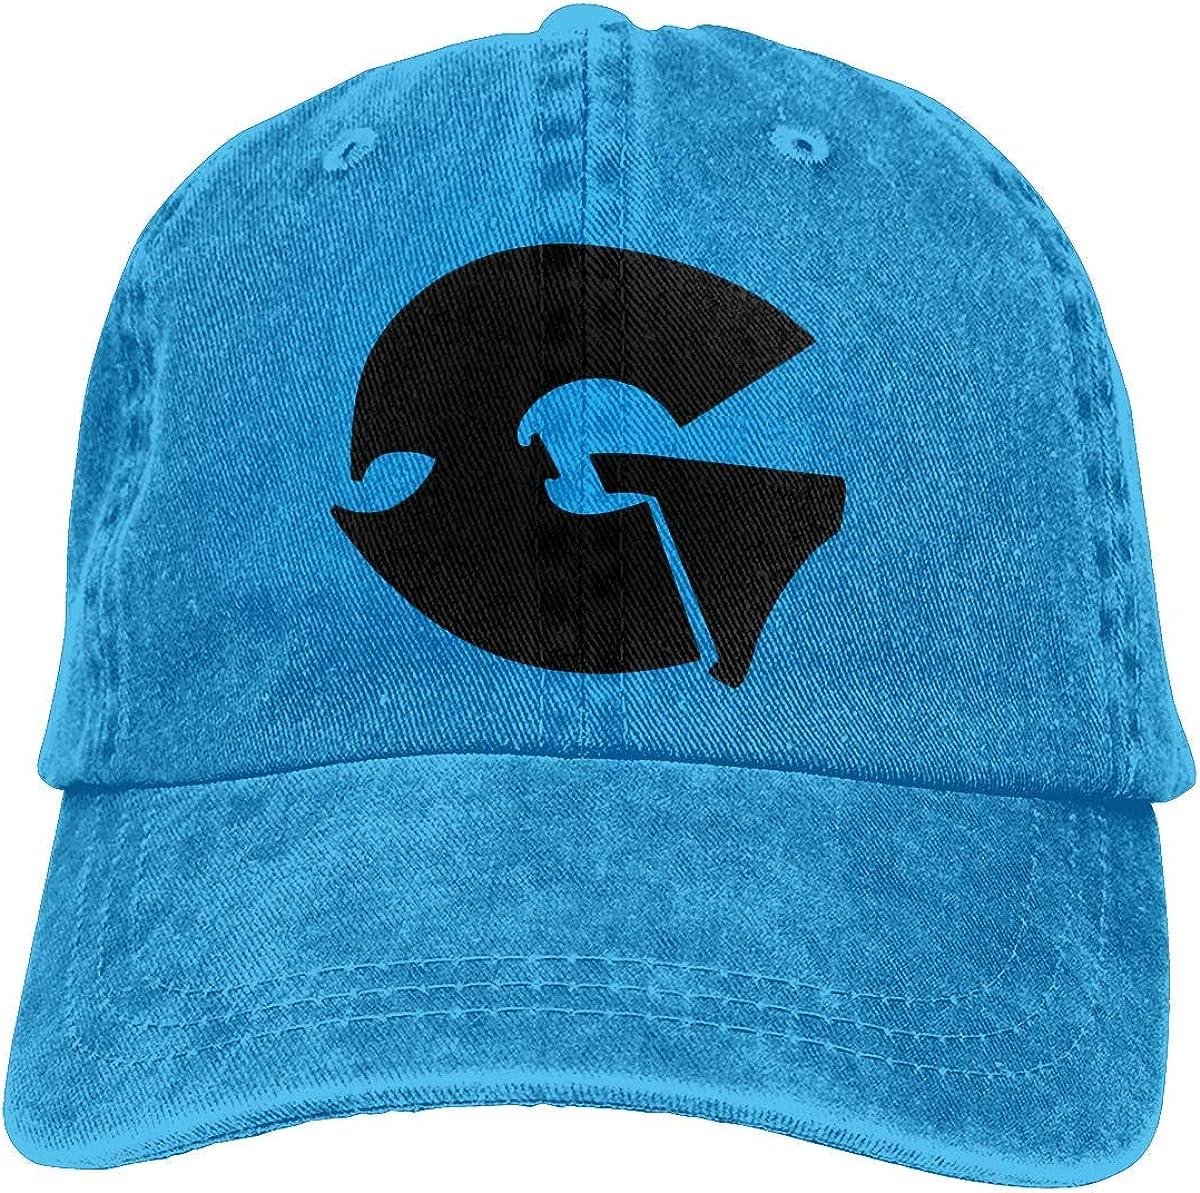 Classic Washed Cotton Baseball Cap Hip Hop Adjustable Dad Hat